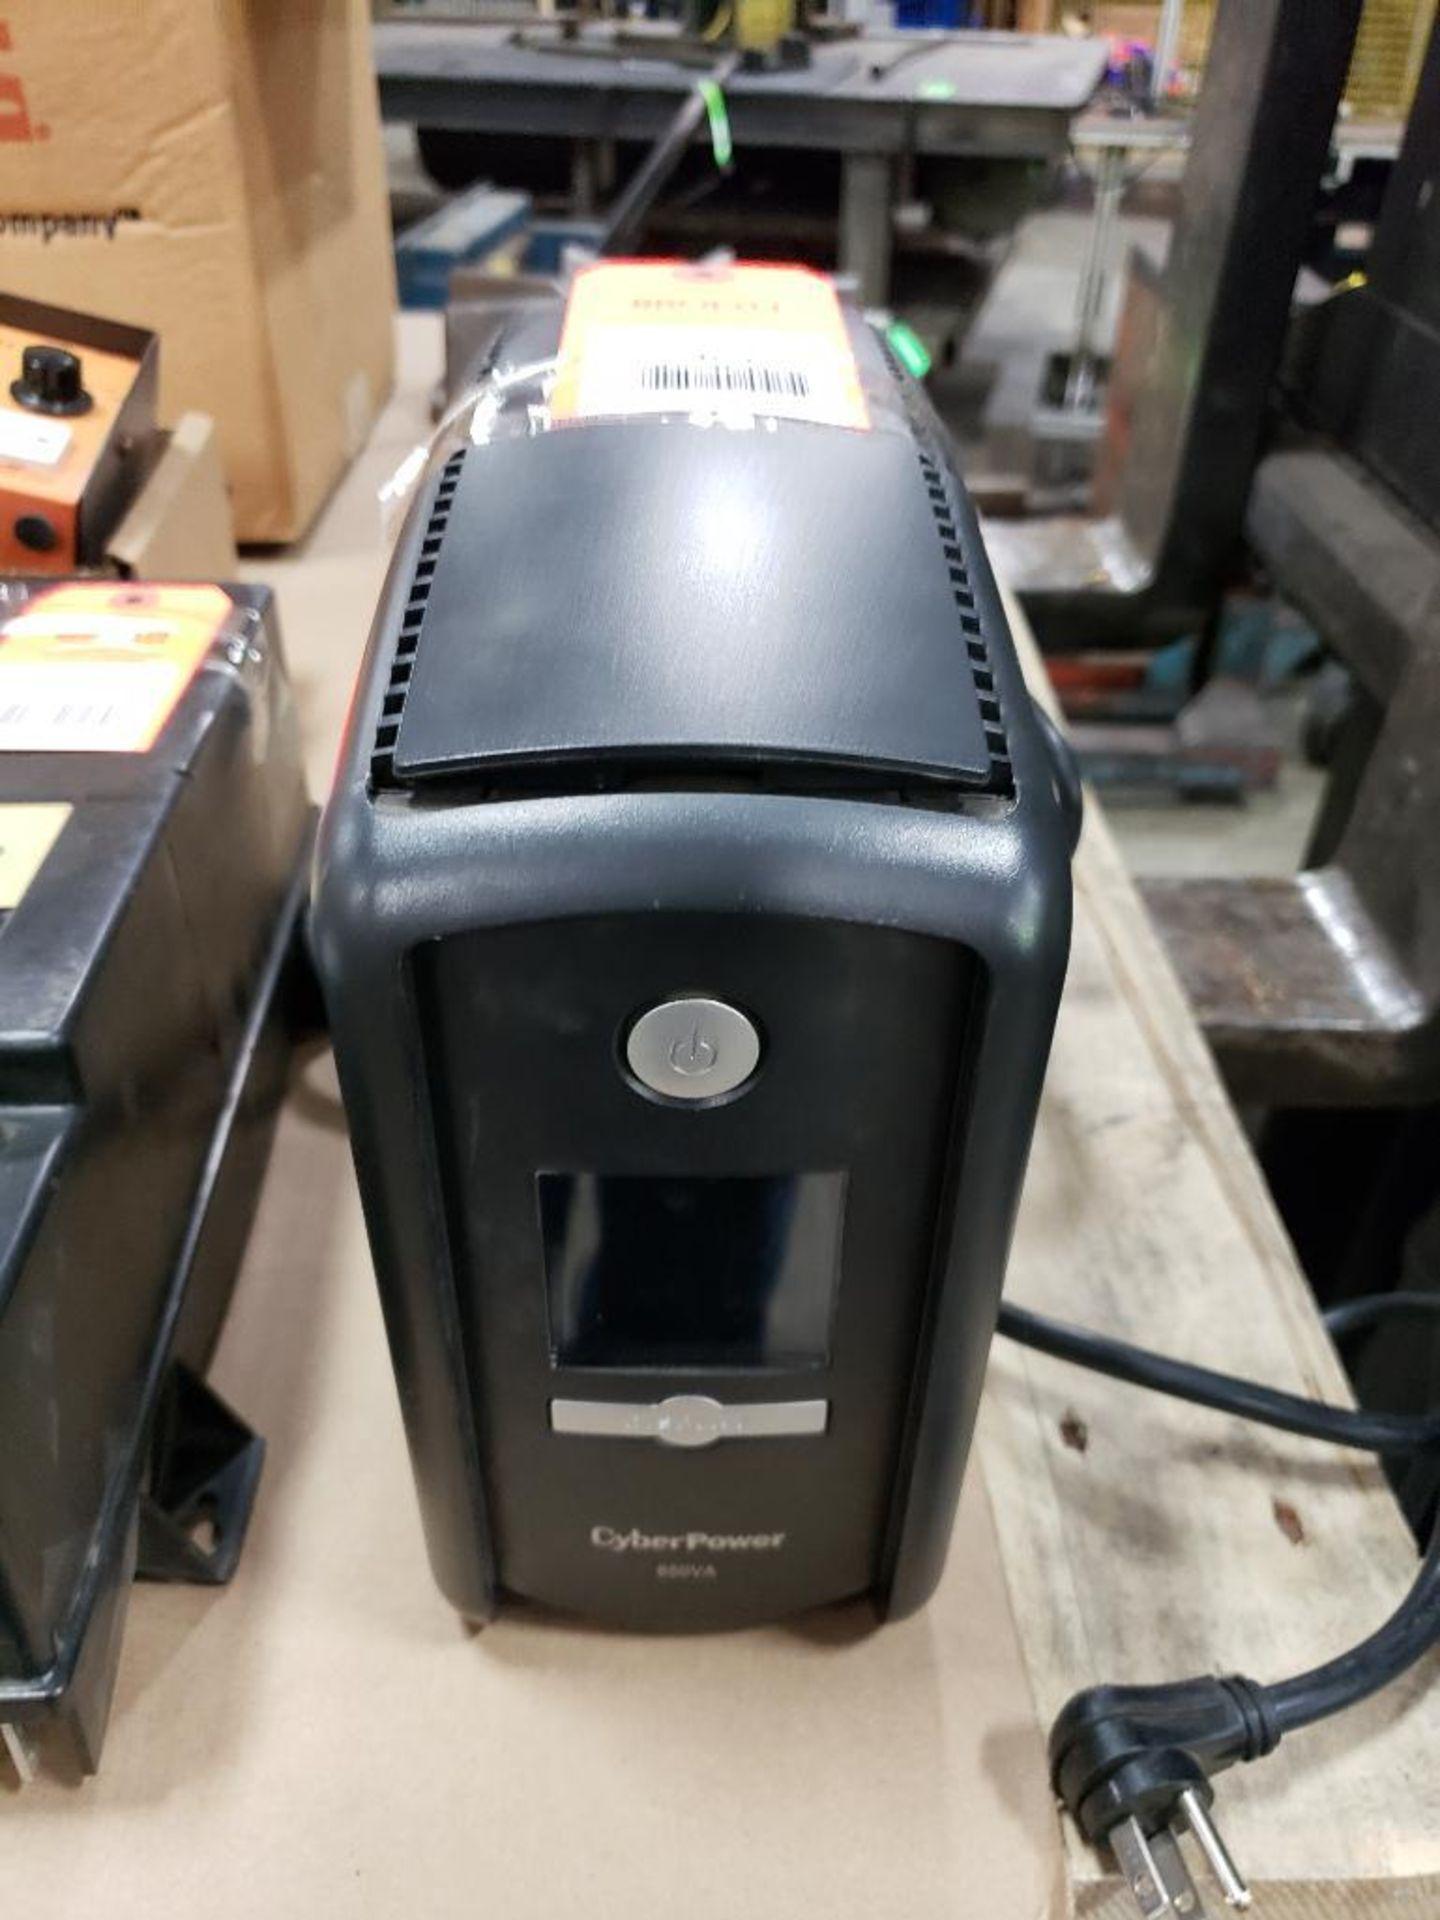 CyberPower CP850AVRLCD intelligent LCD power supply.